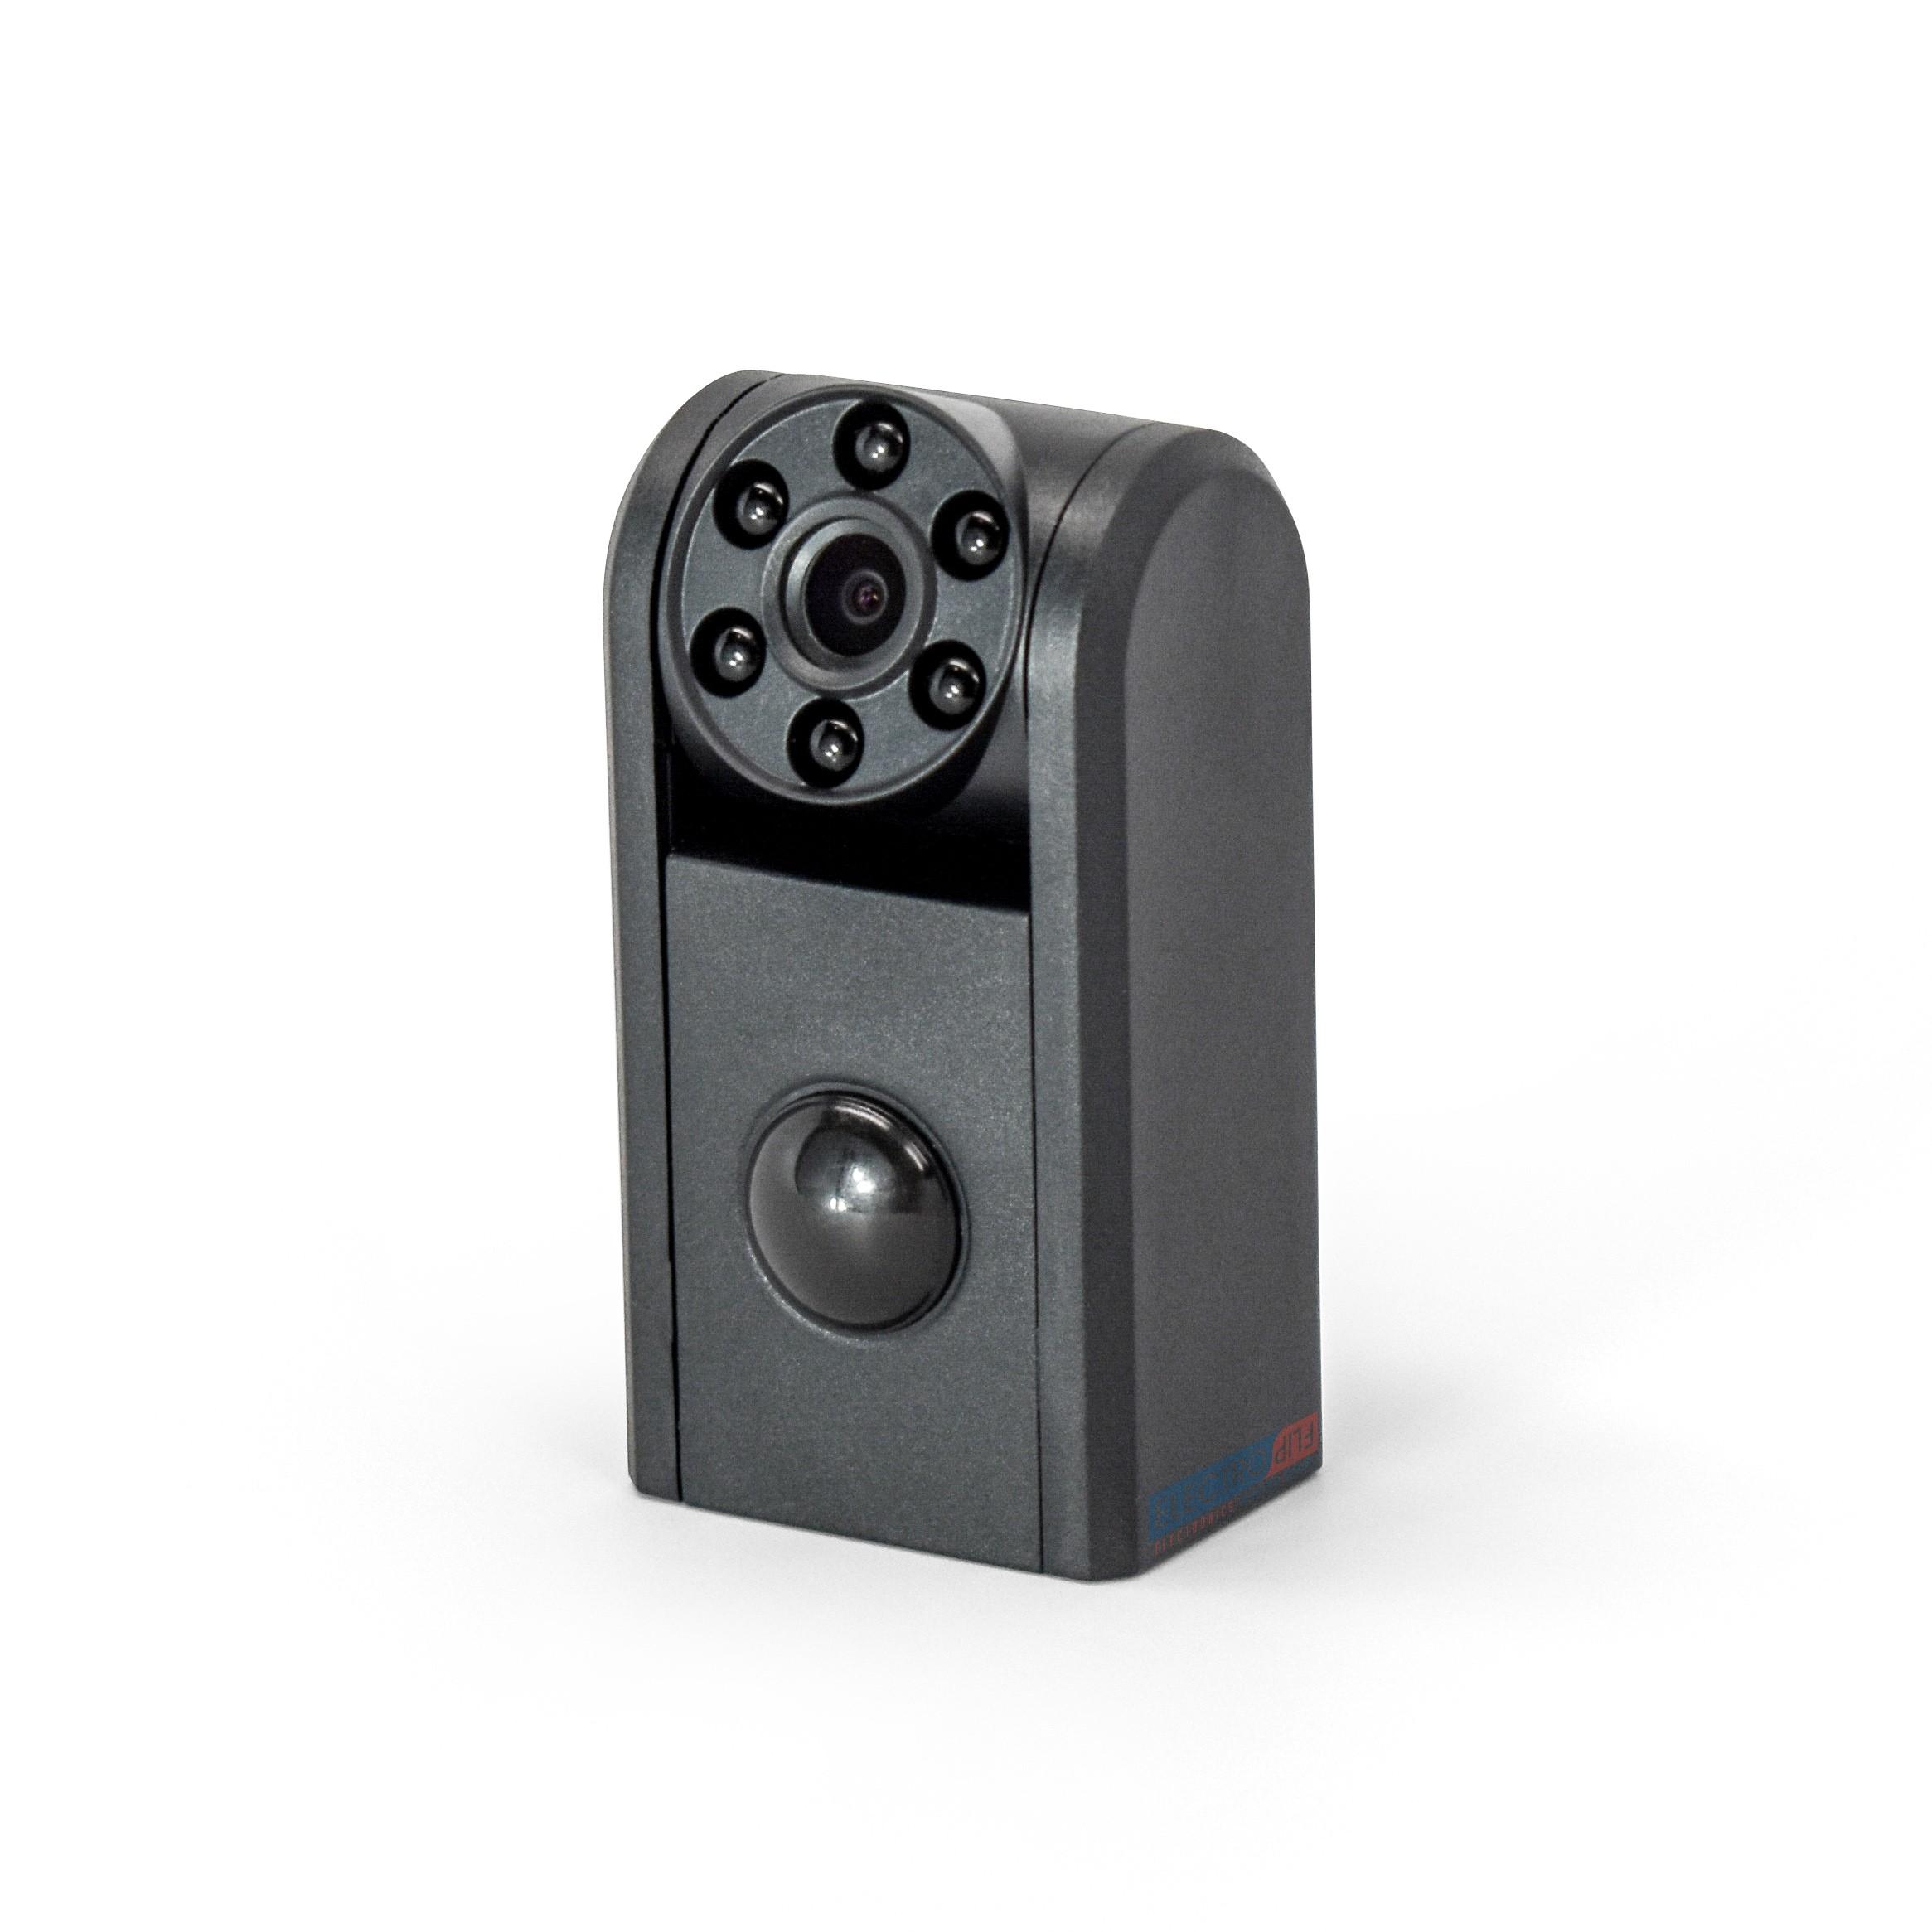 NiteEye3 - Rotating Lens NightVision DVR Camera